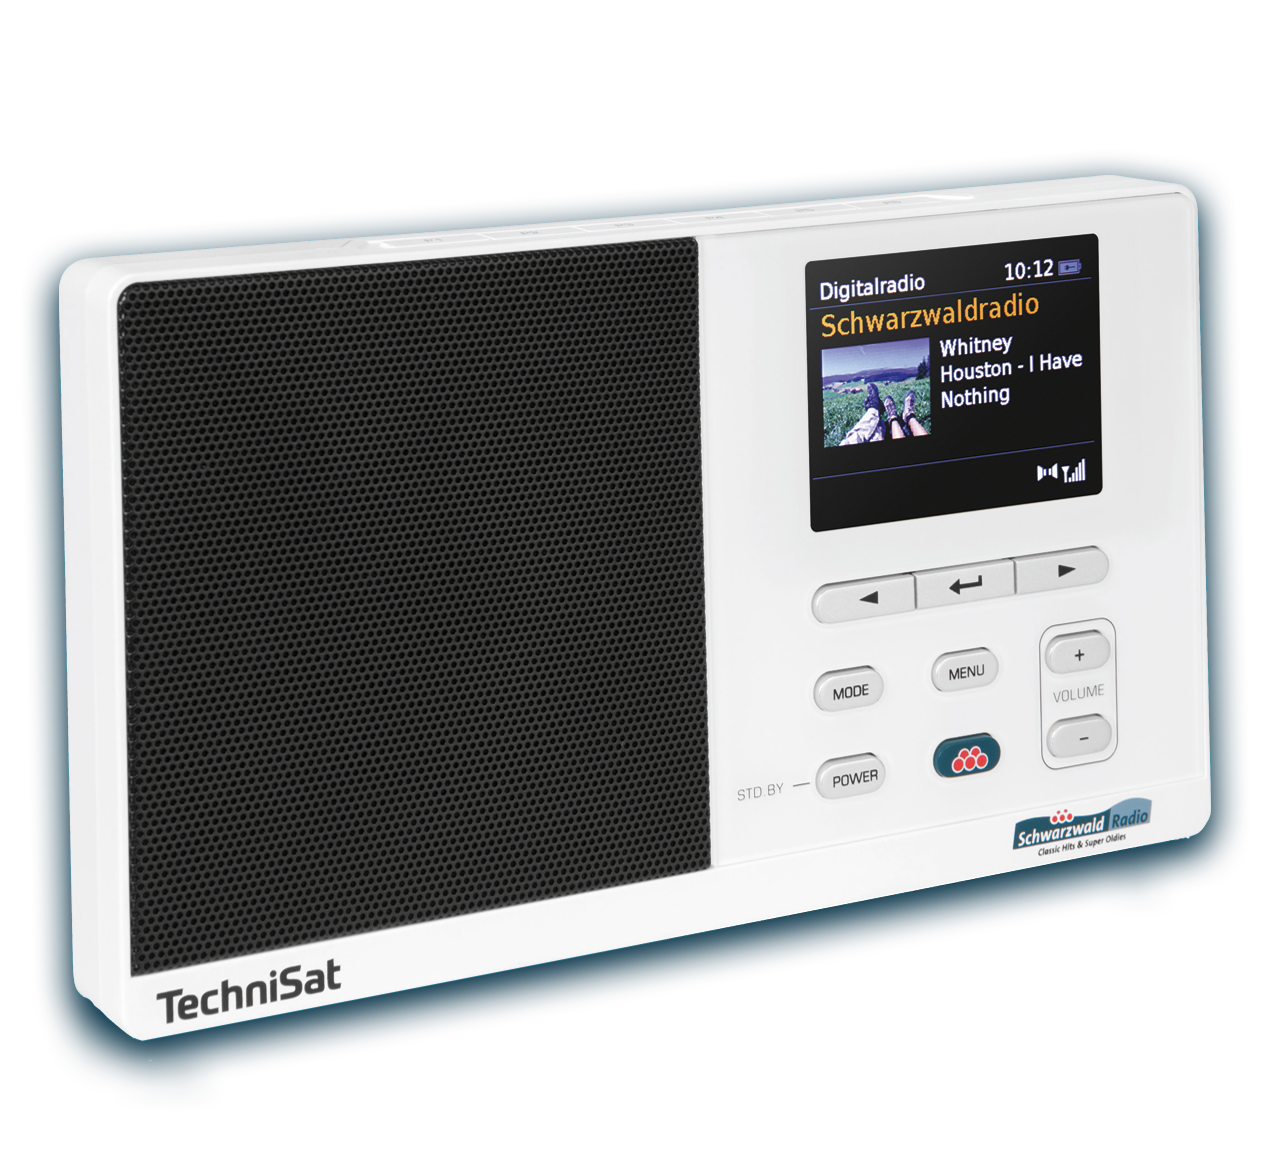 Technisat Digitalradio SCHWARZWALDRADIO